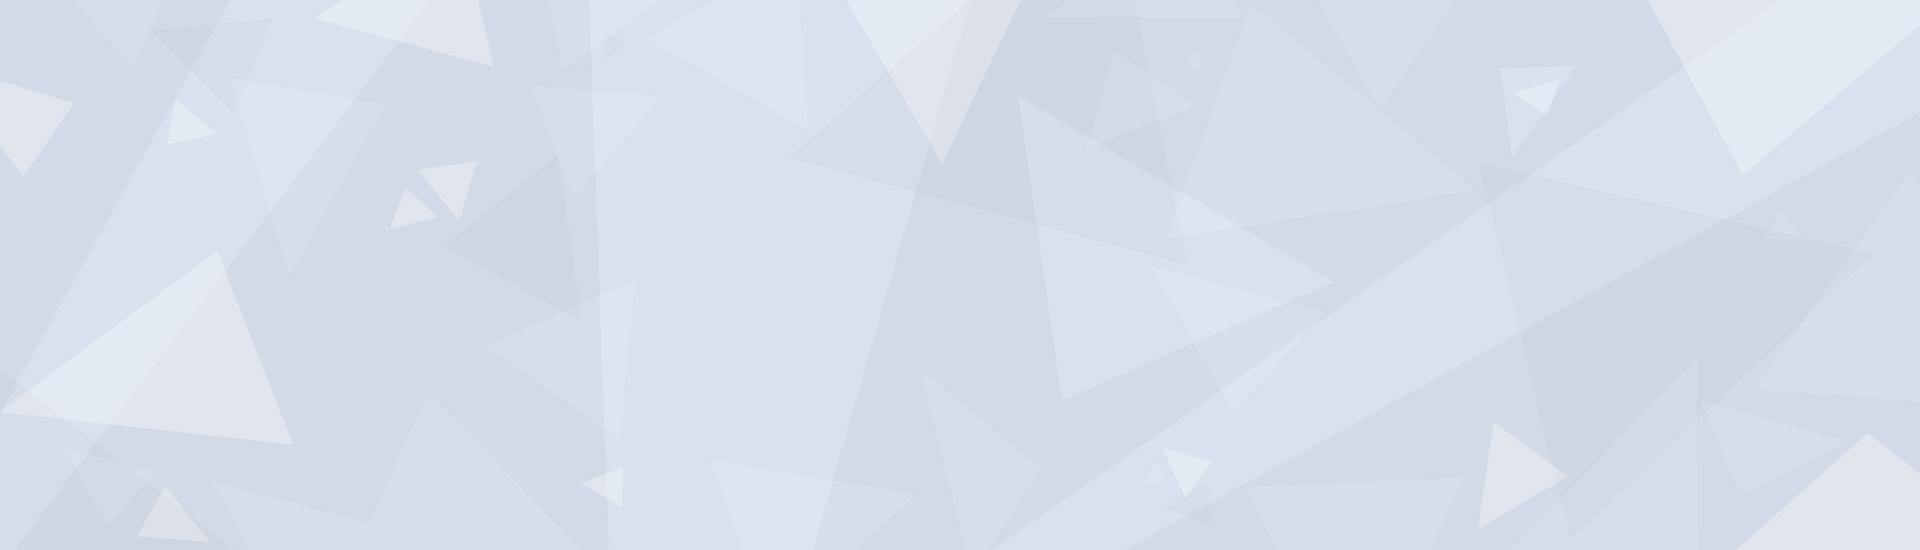 Fardec - VSLeague Online eSport